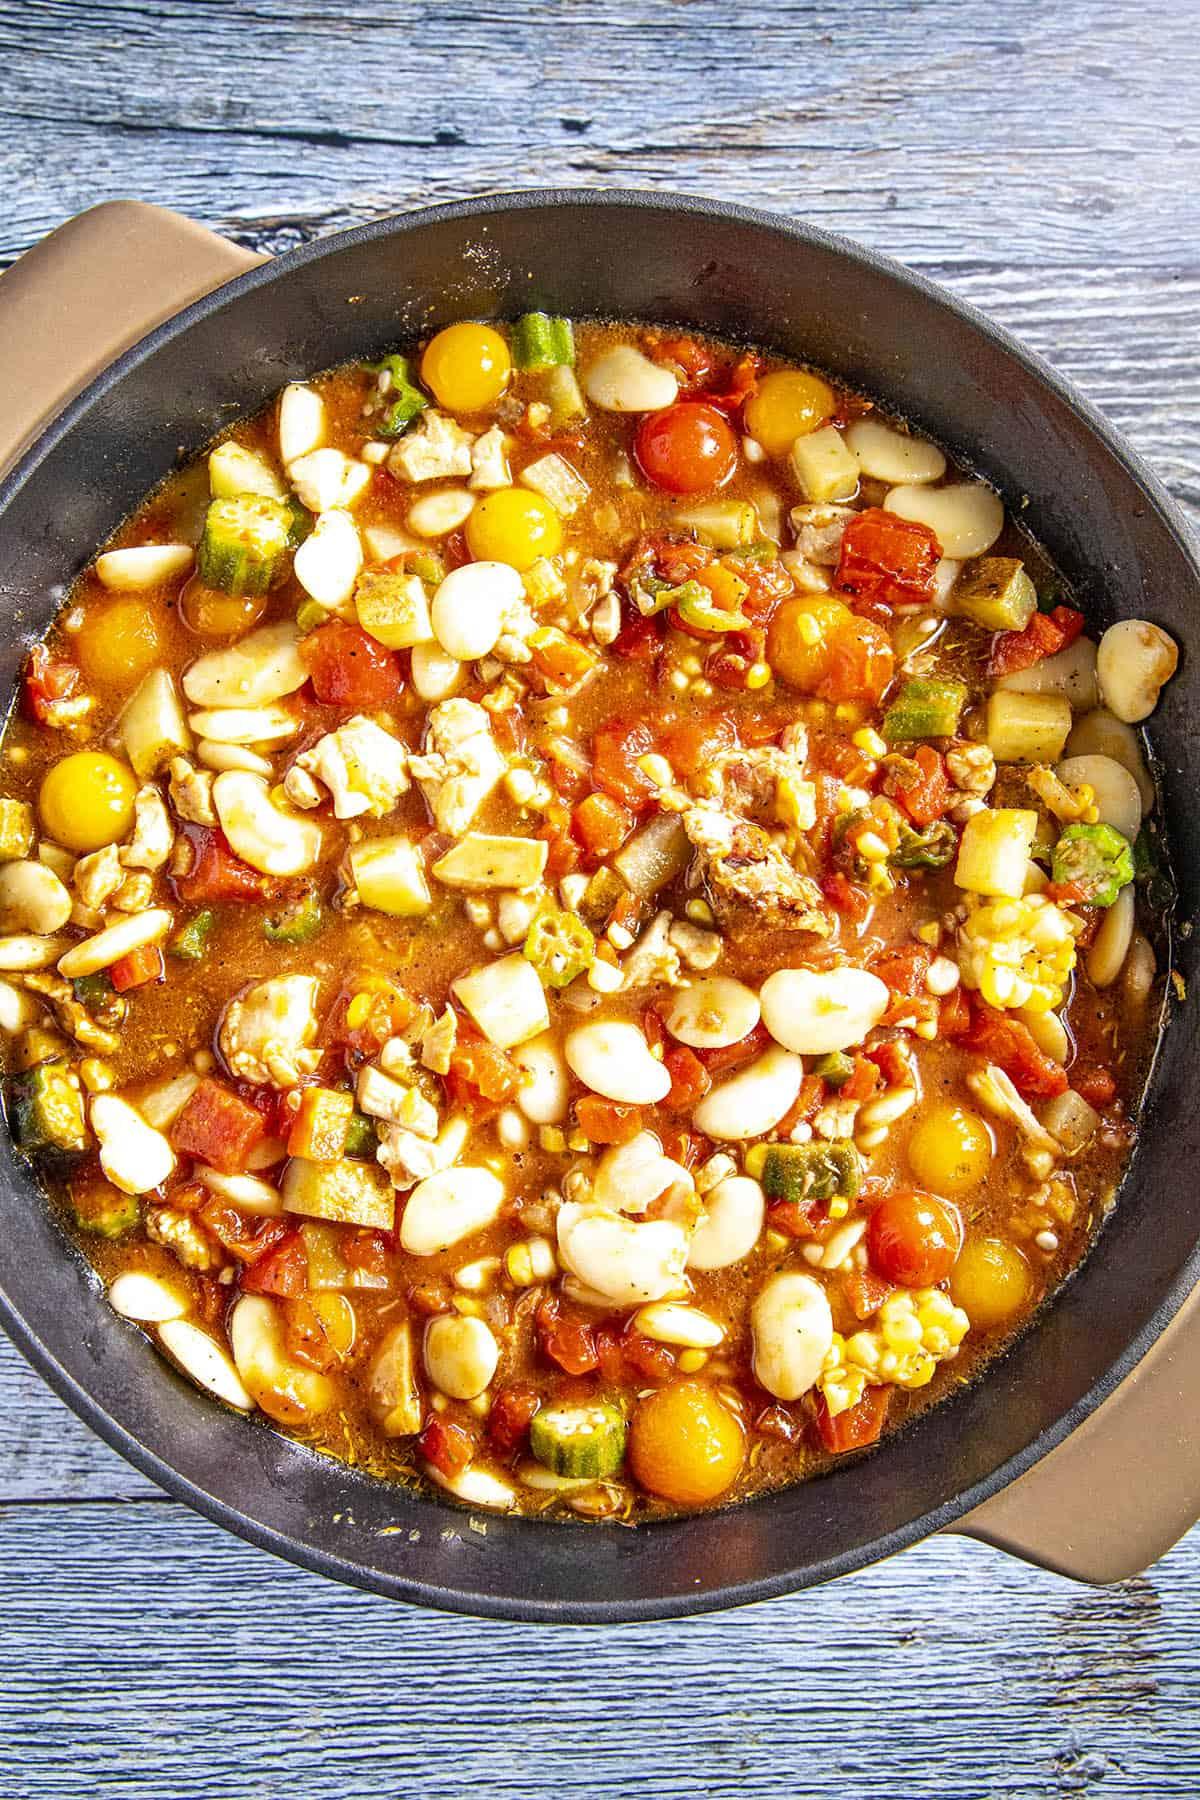 Brunswick Stew simmering in a pot